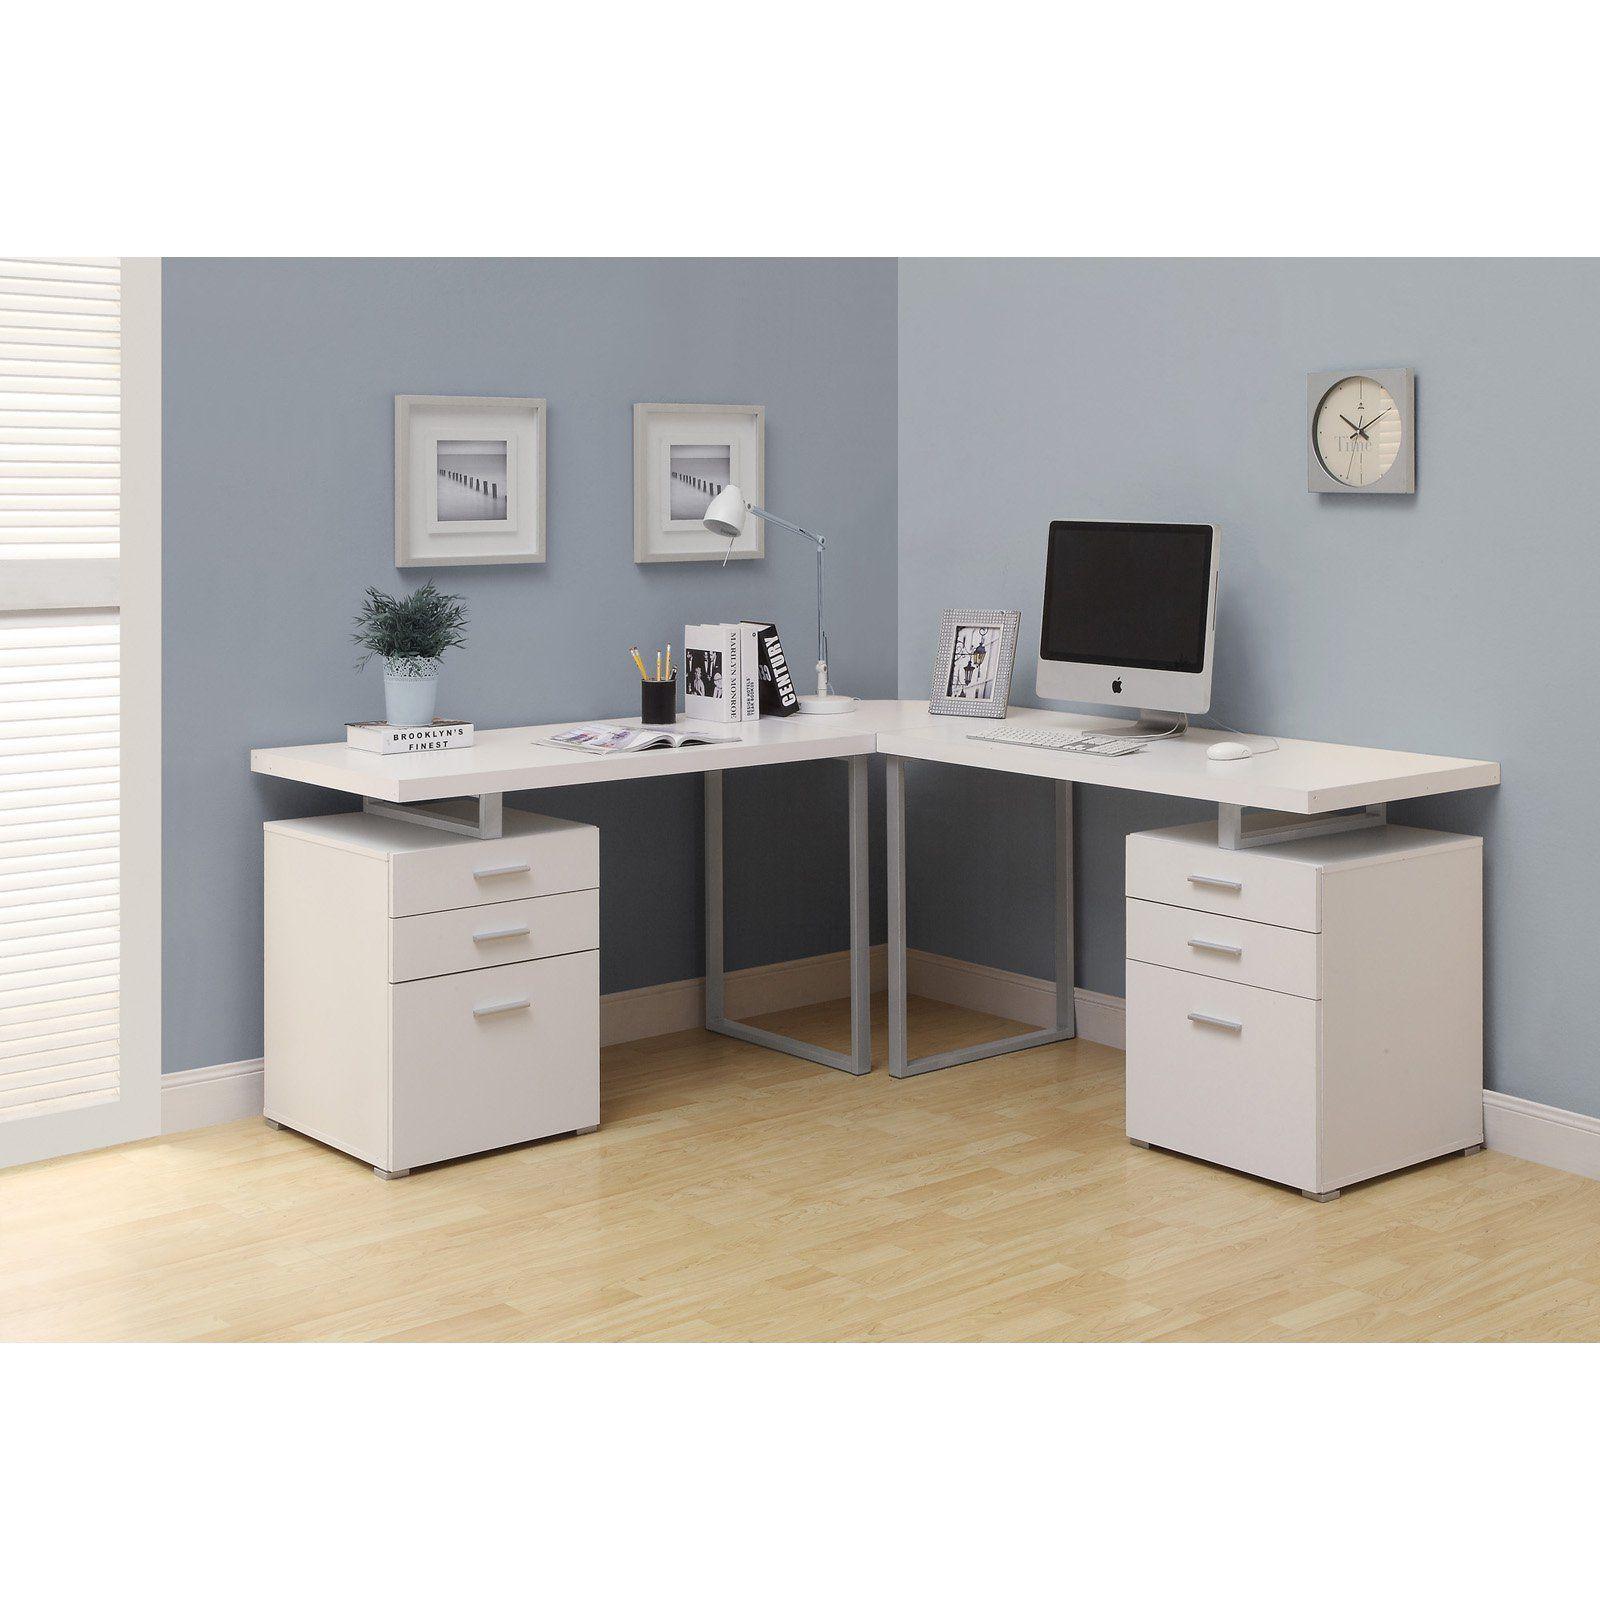 Monarch Specialties L Shaped Corner Desk Walmart Com White Corner Desk L Shaped Corner Desk Home Office Design